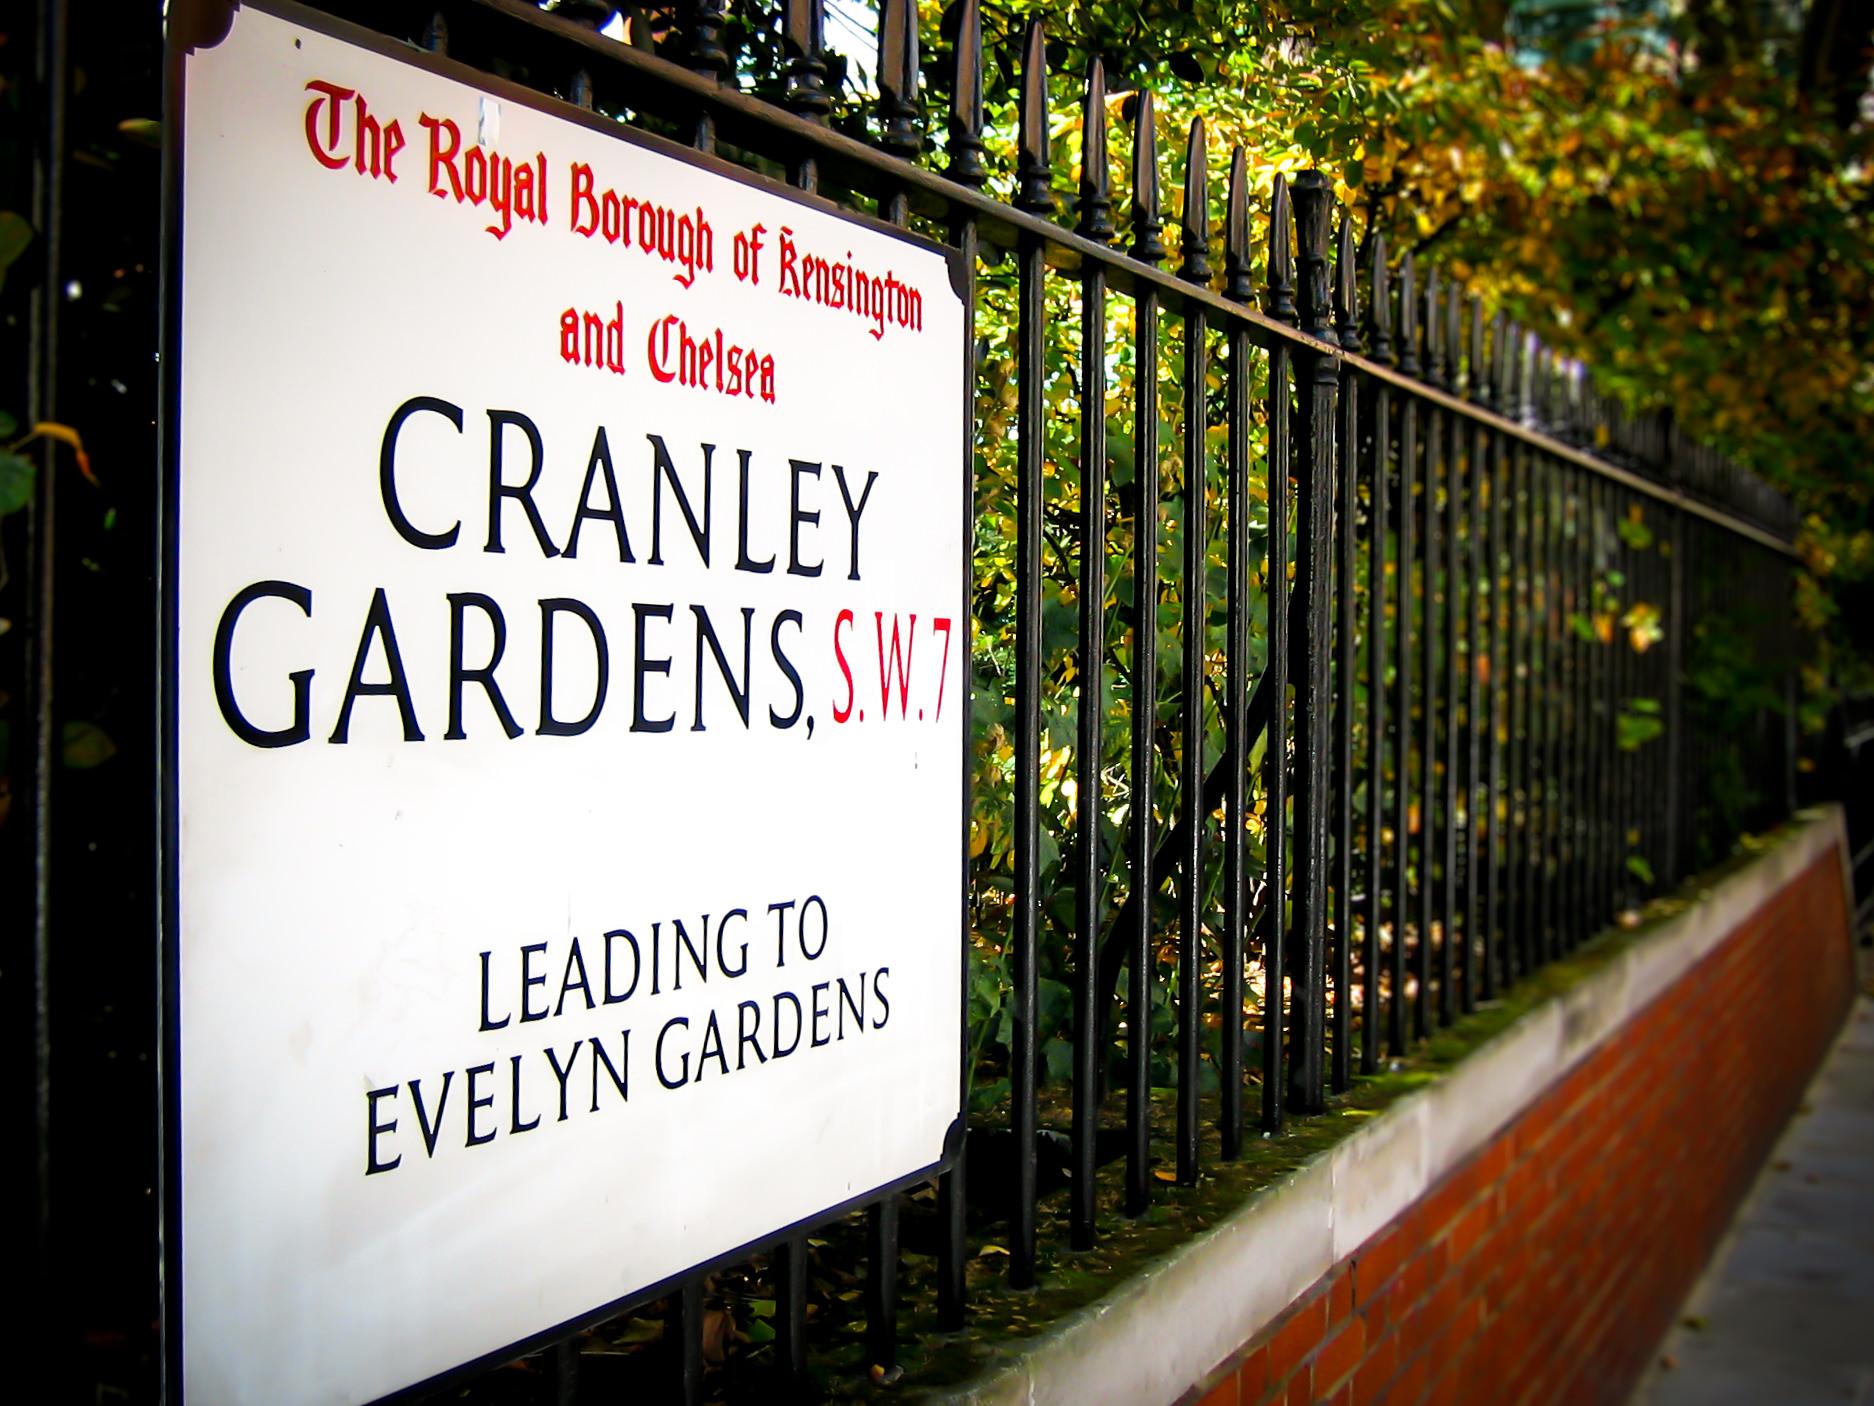 Cranley Gardens